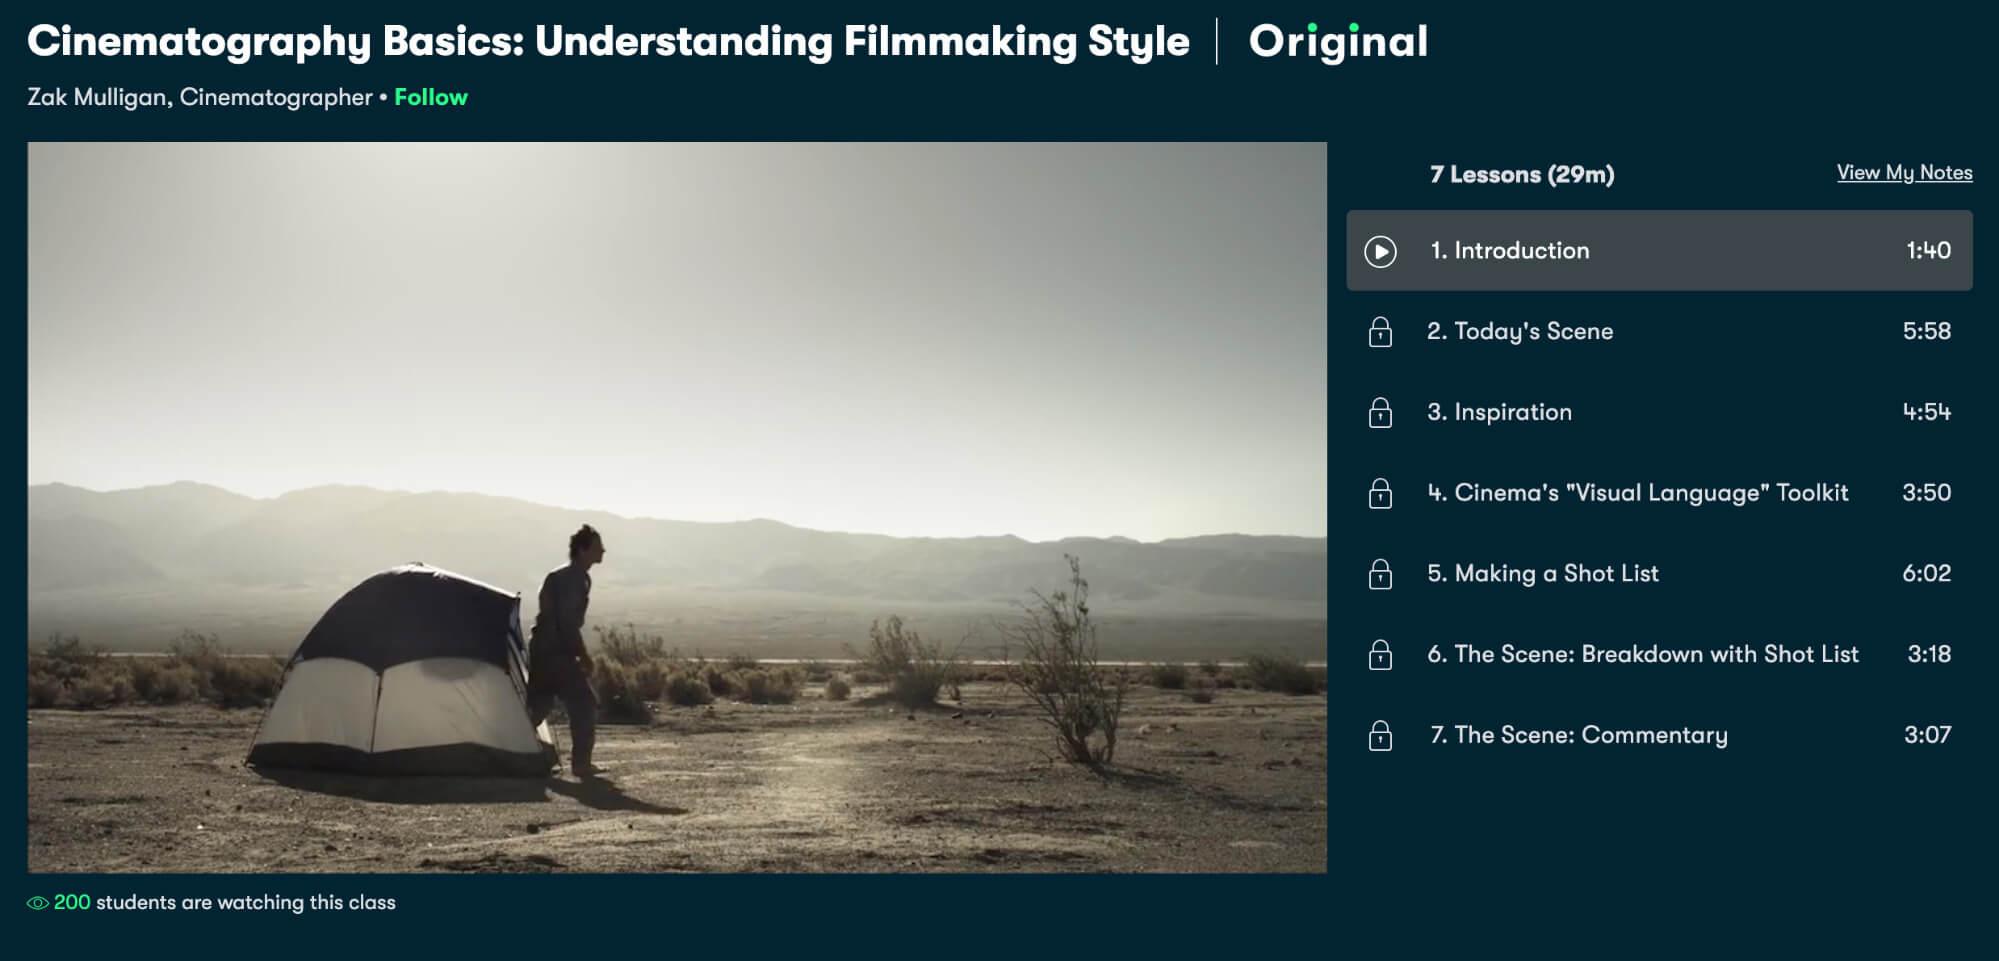 SkillShare Cinematography Course